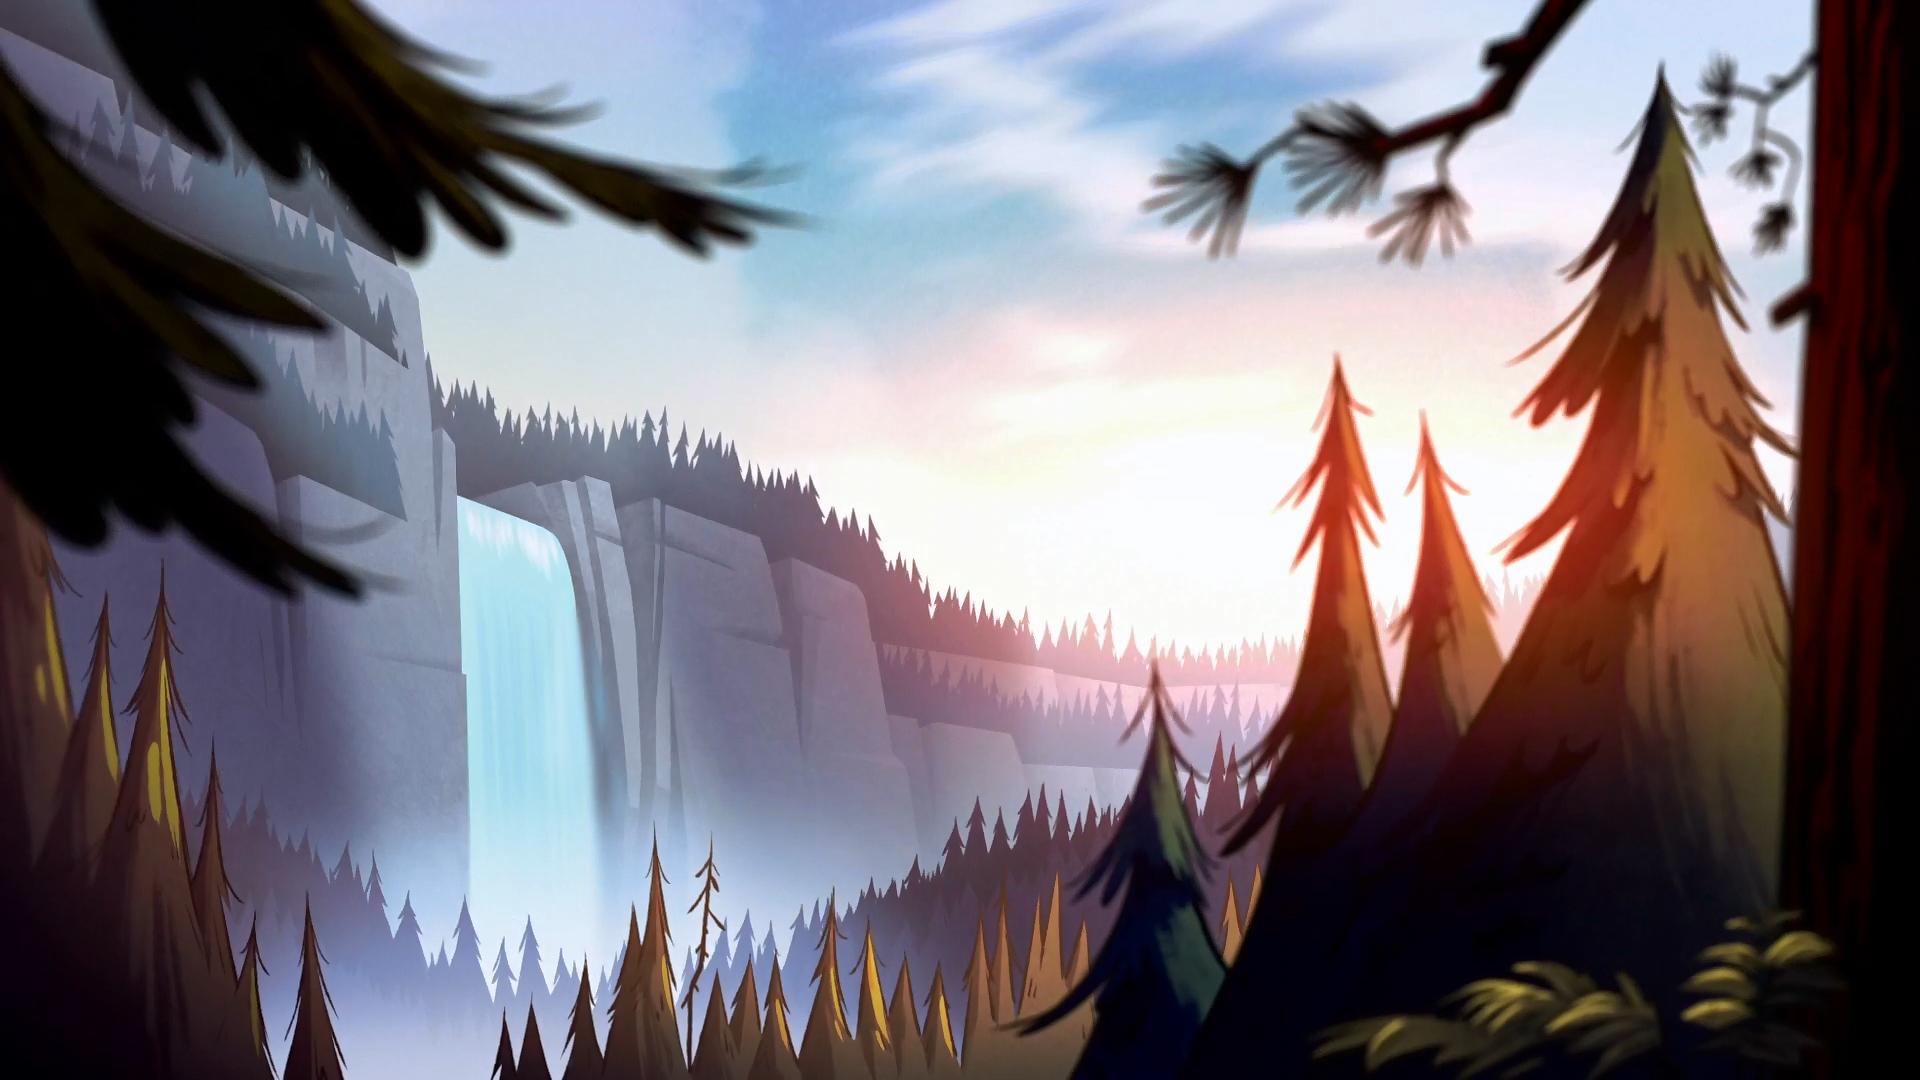 Gravity Falls Album On Imgur Fall Wallpaper Gravity Falls Secrets Gravity Falls Art